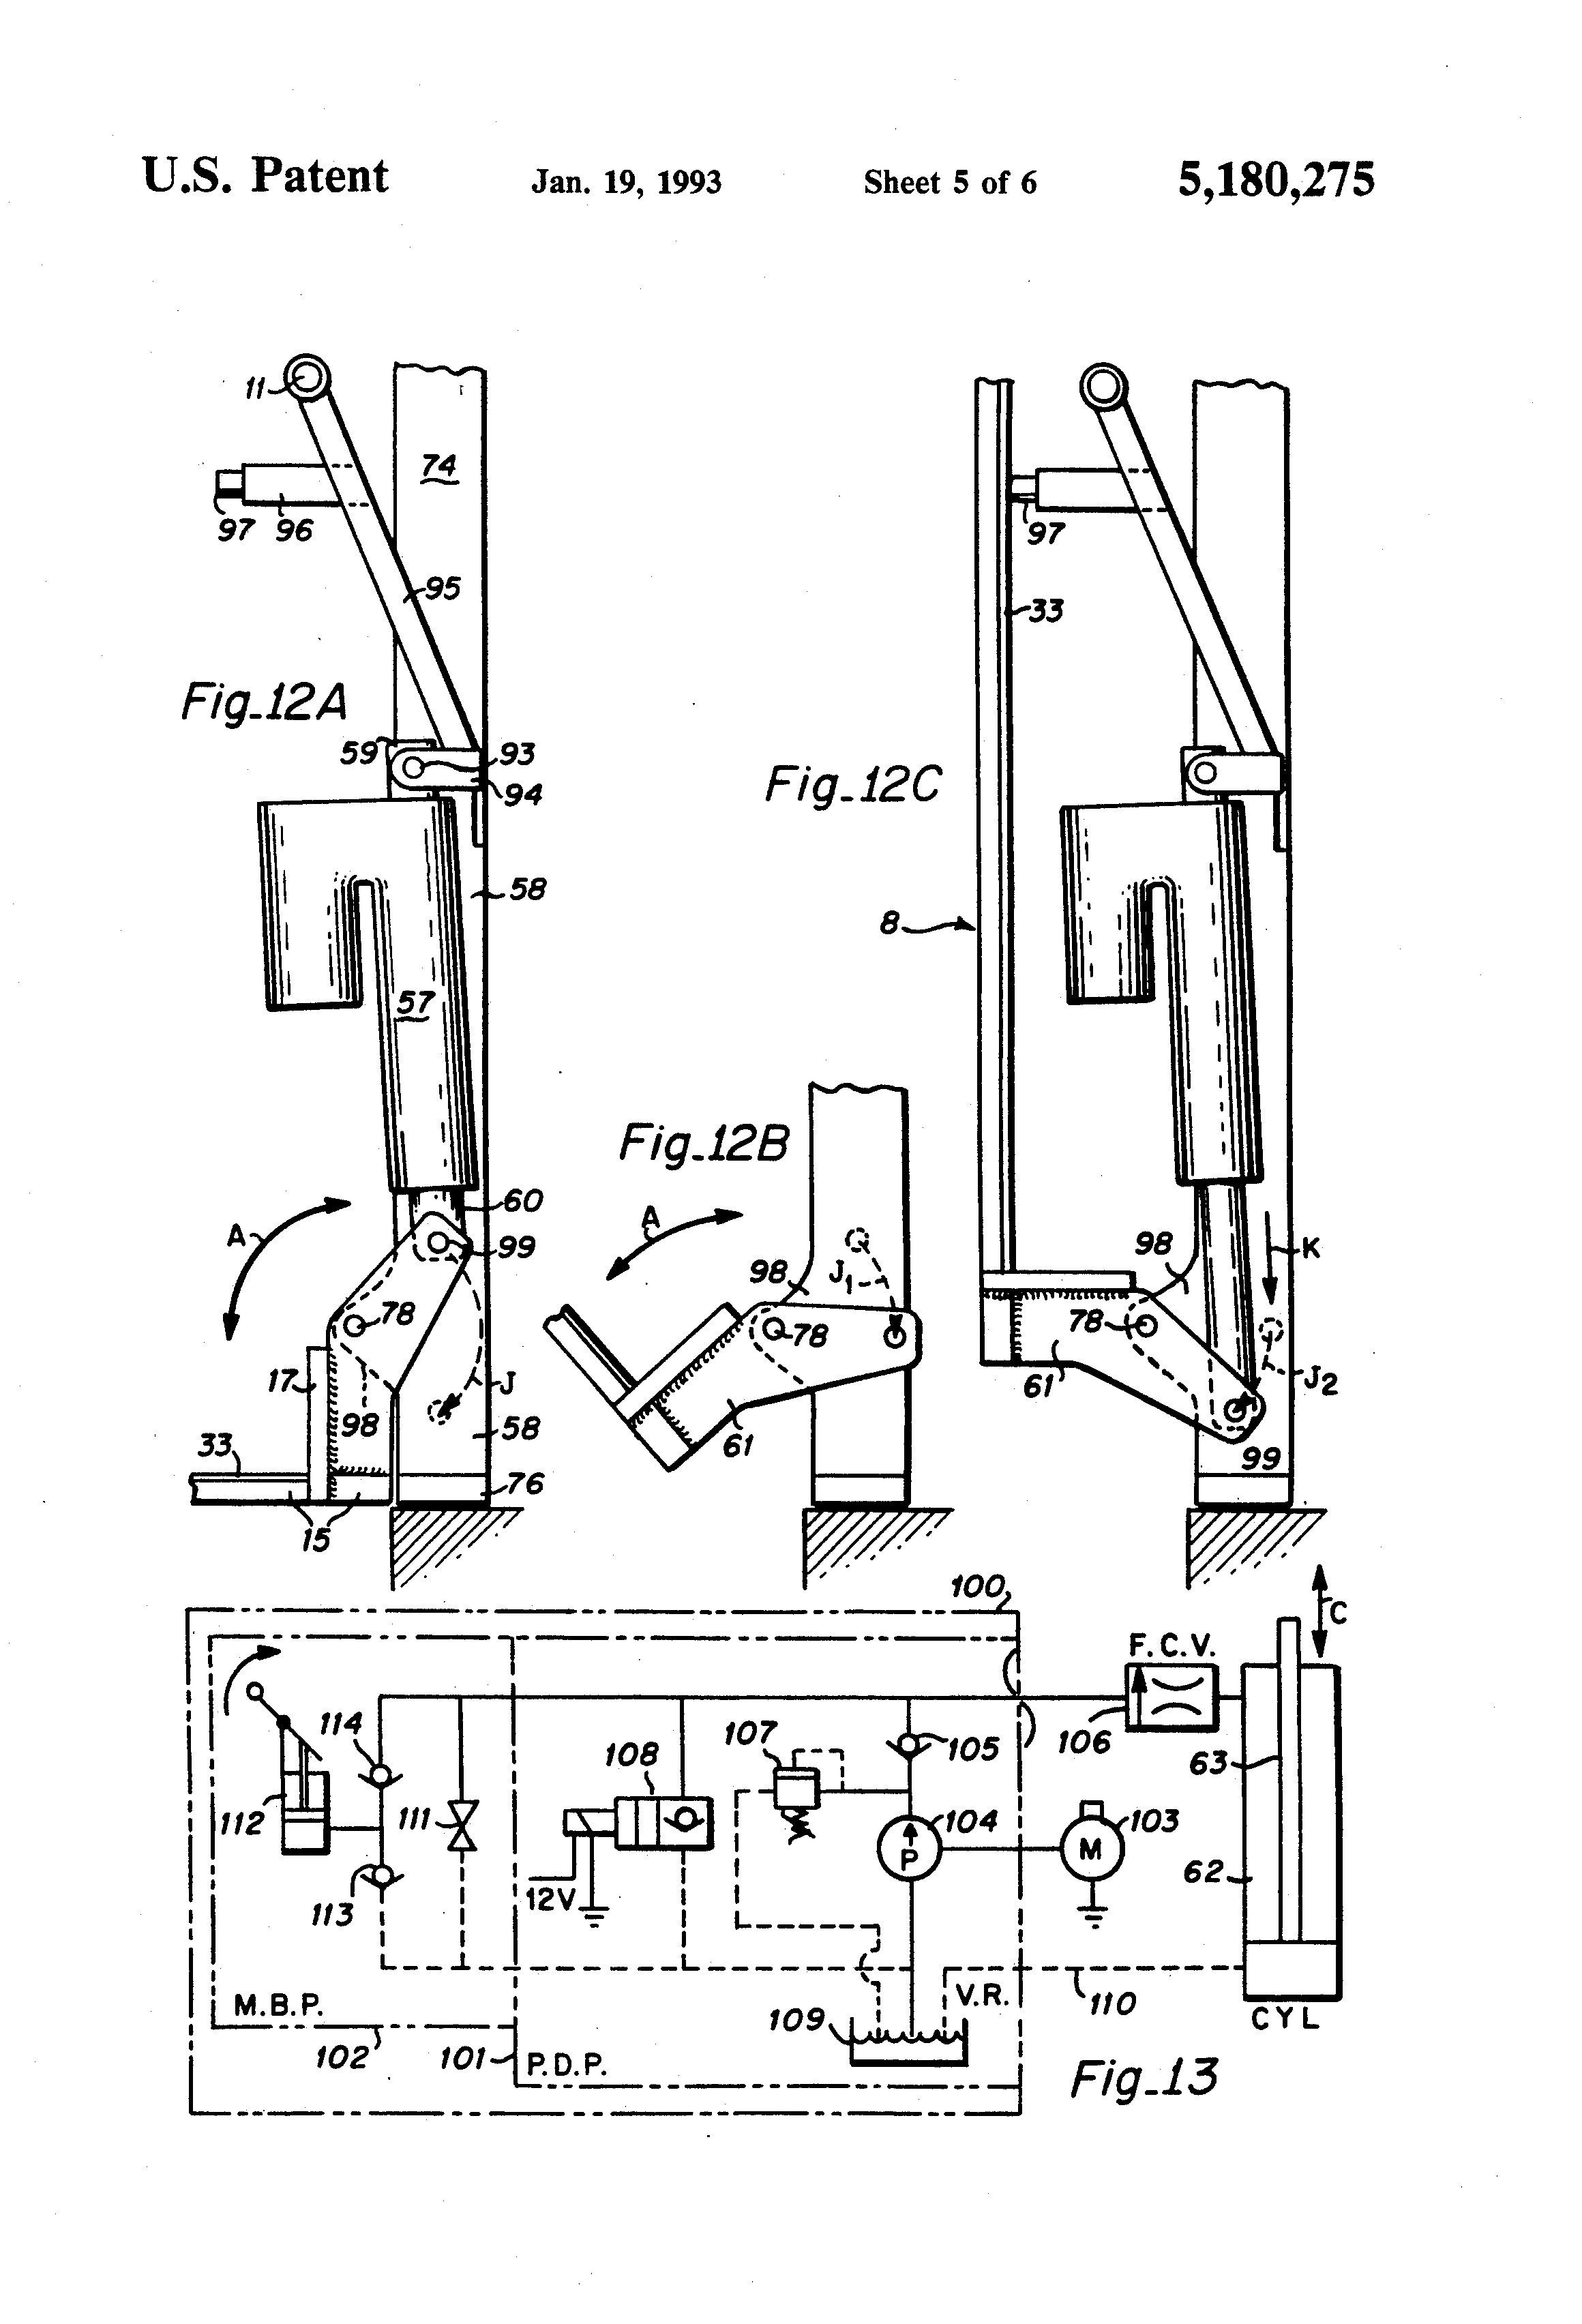 small resolution of elegant automotive electrical wiring diagram symbols diagrams digramssample diagramimages wiringdiagramsample wiringdiagram